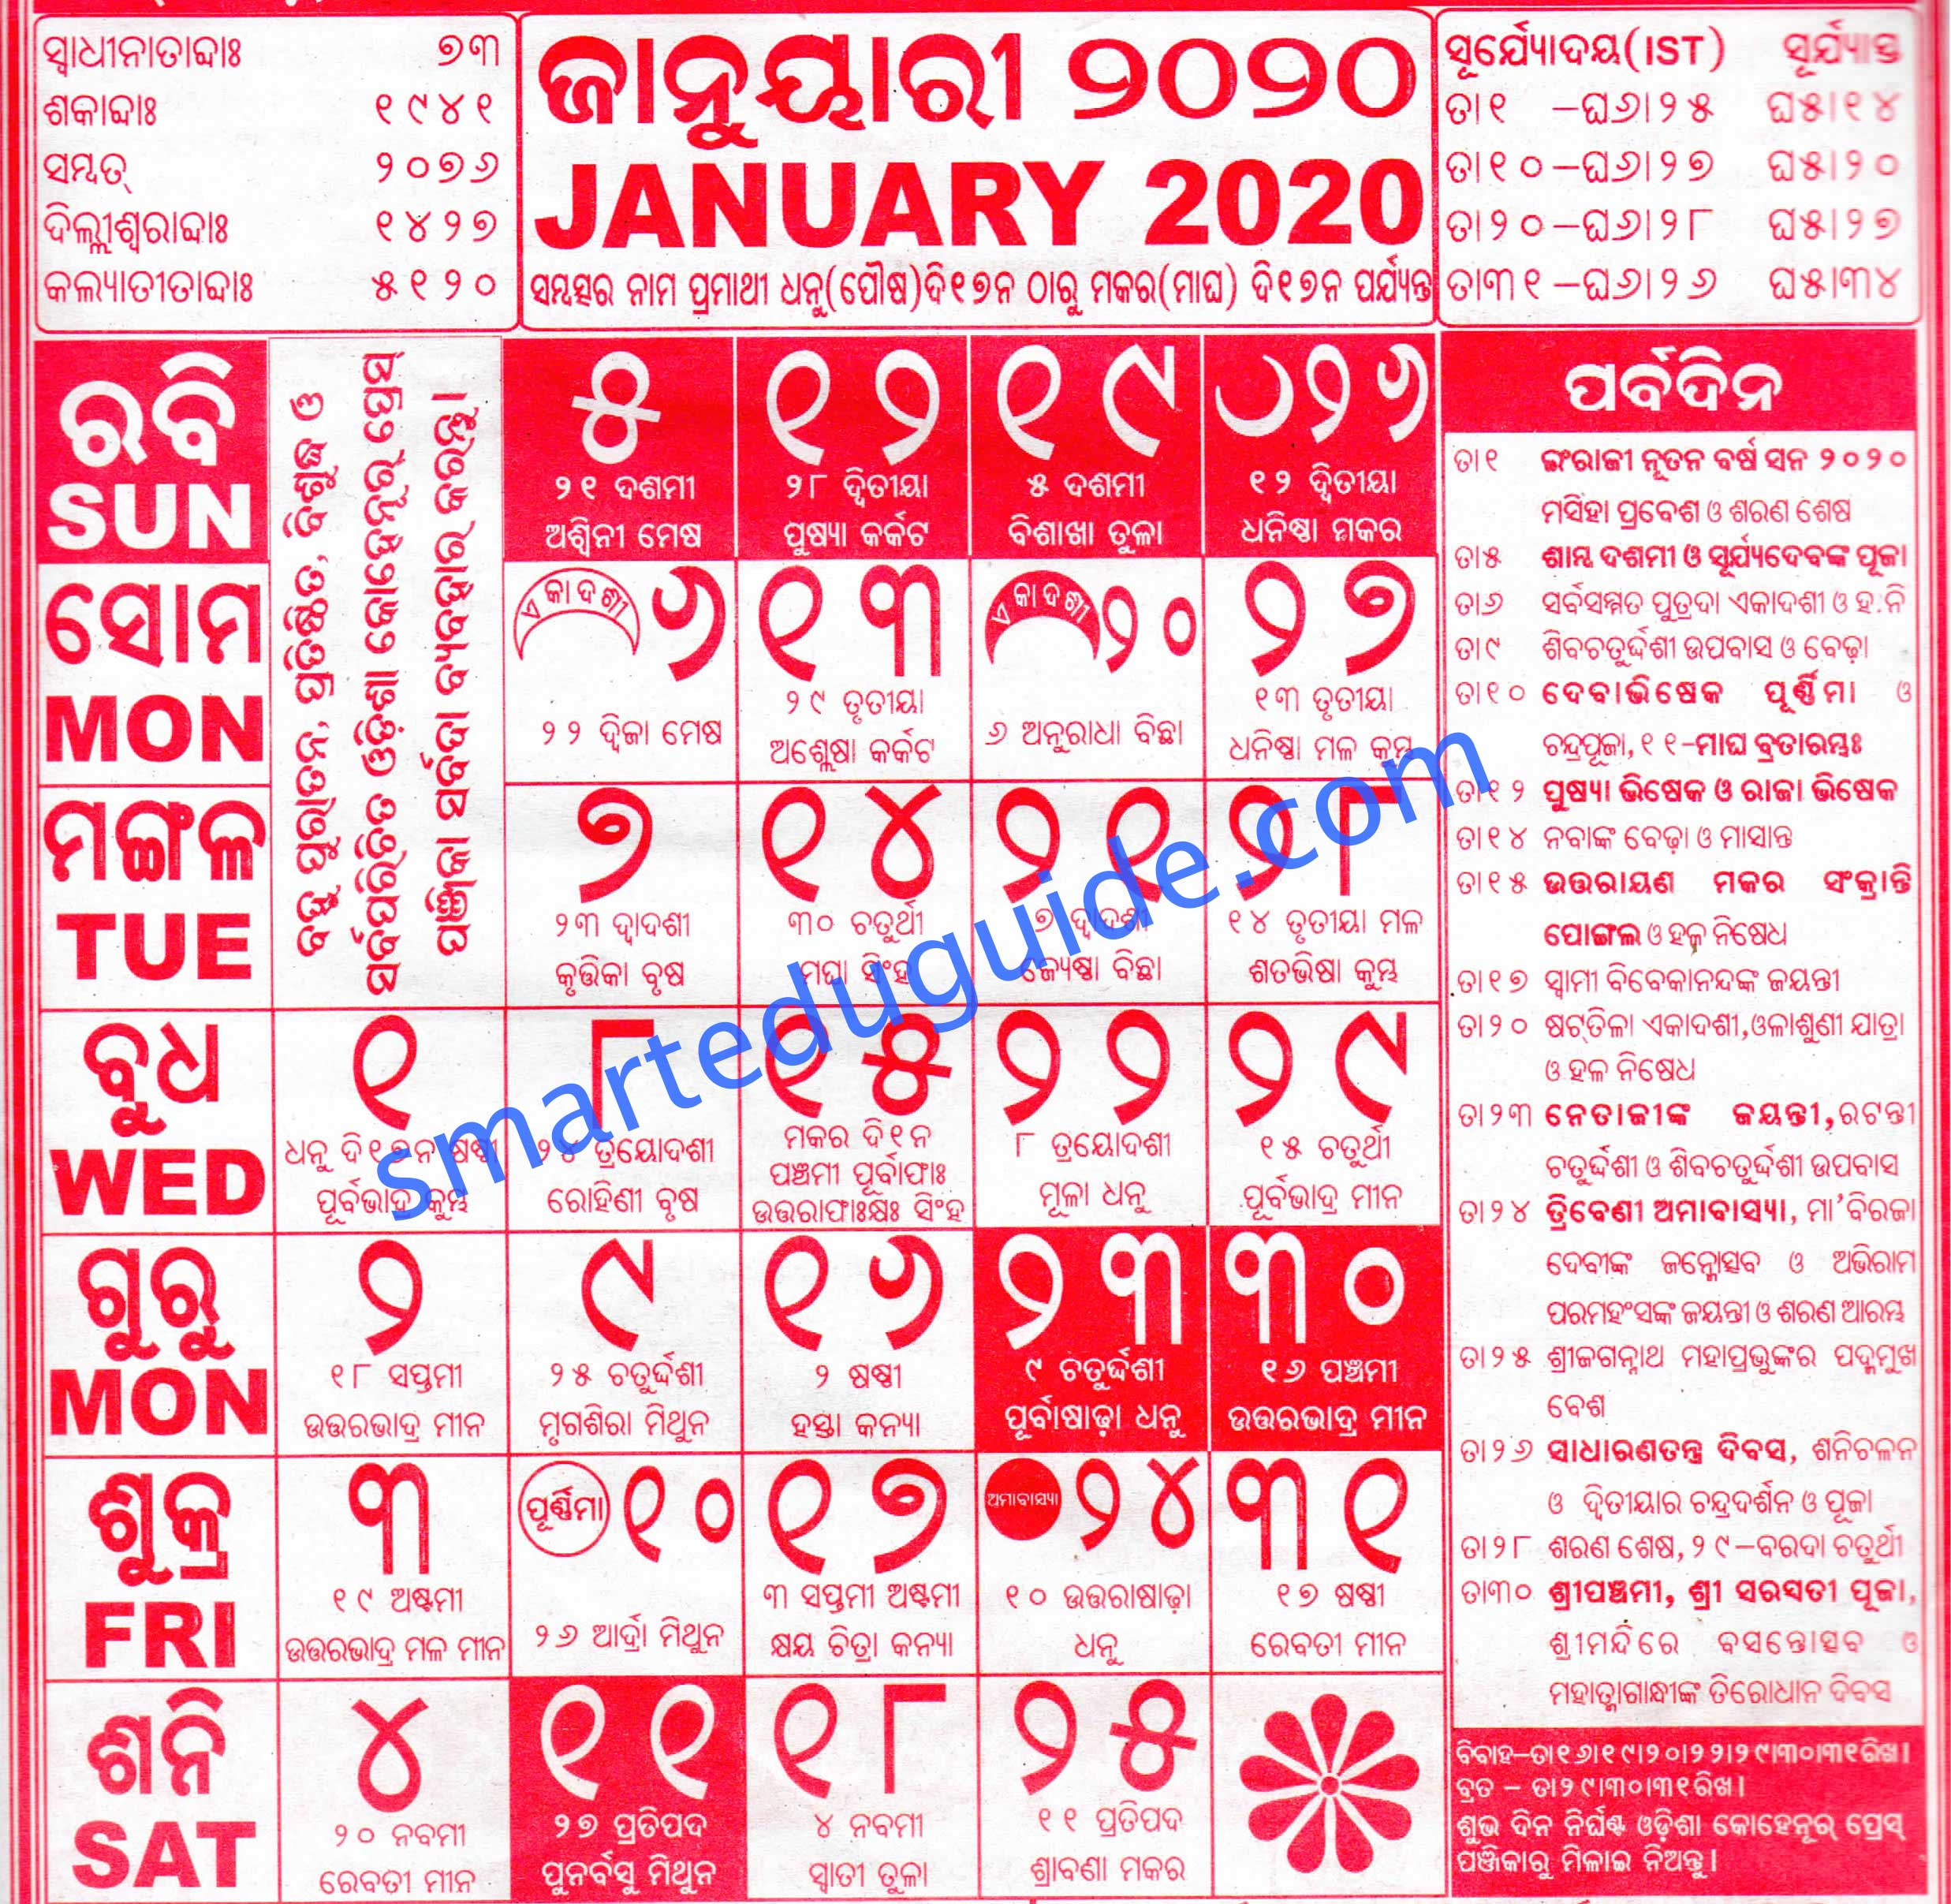 Odia Calendar 2020 Kohinoor Pdf | Seg for Bhagyadeep Odia Calendar 2020